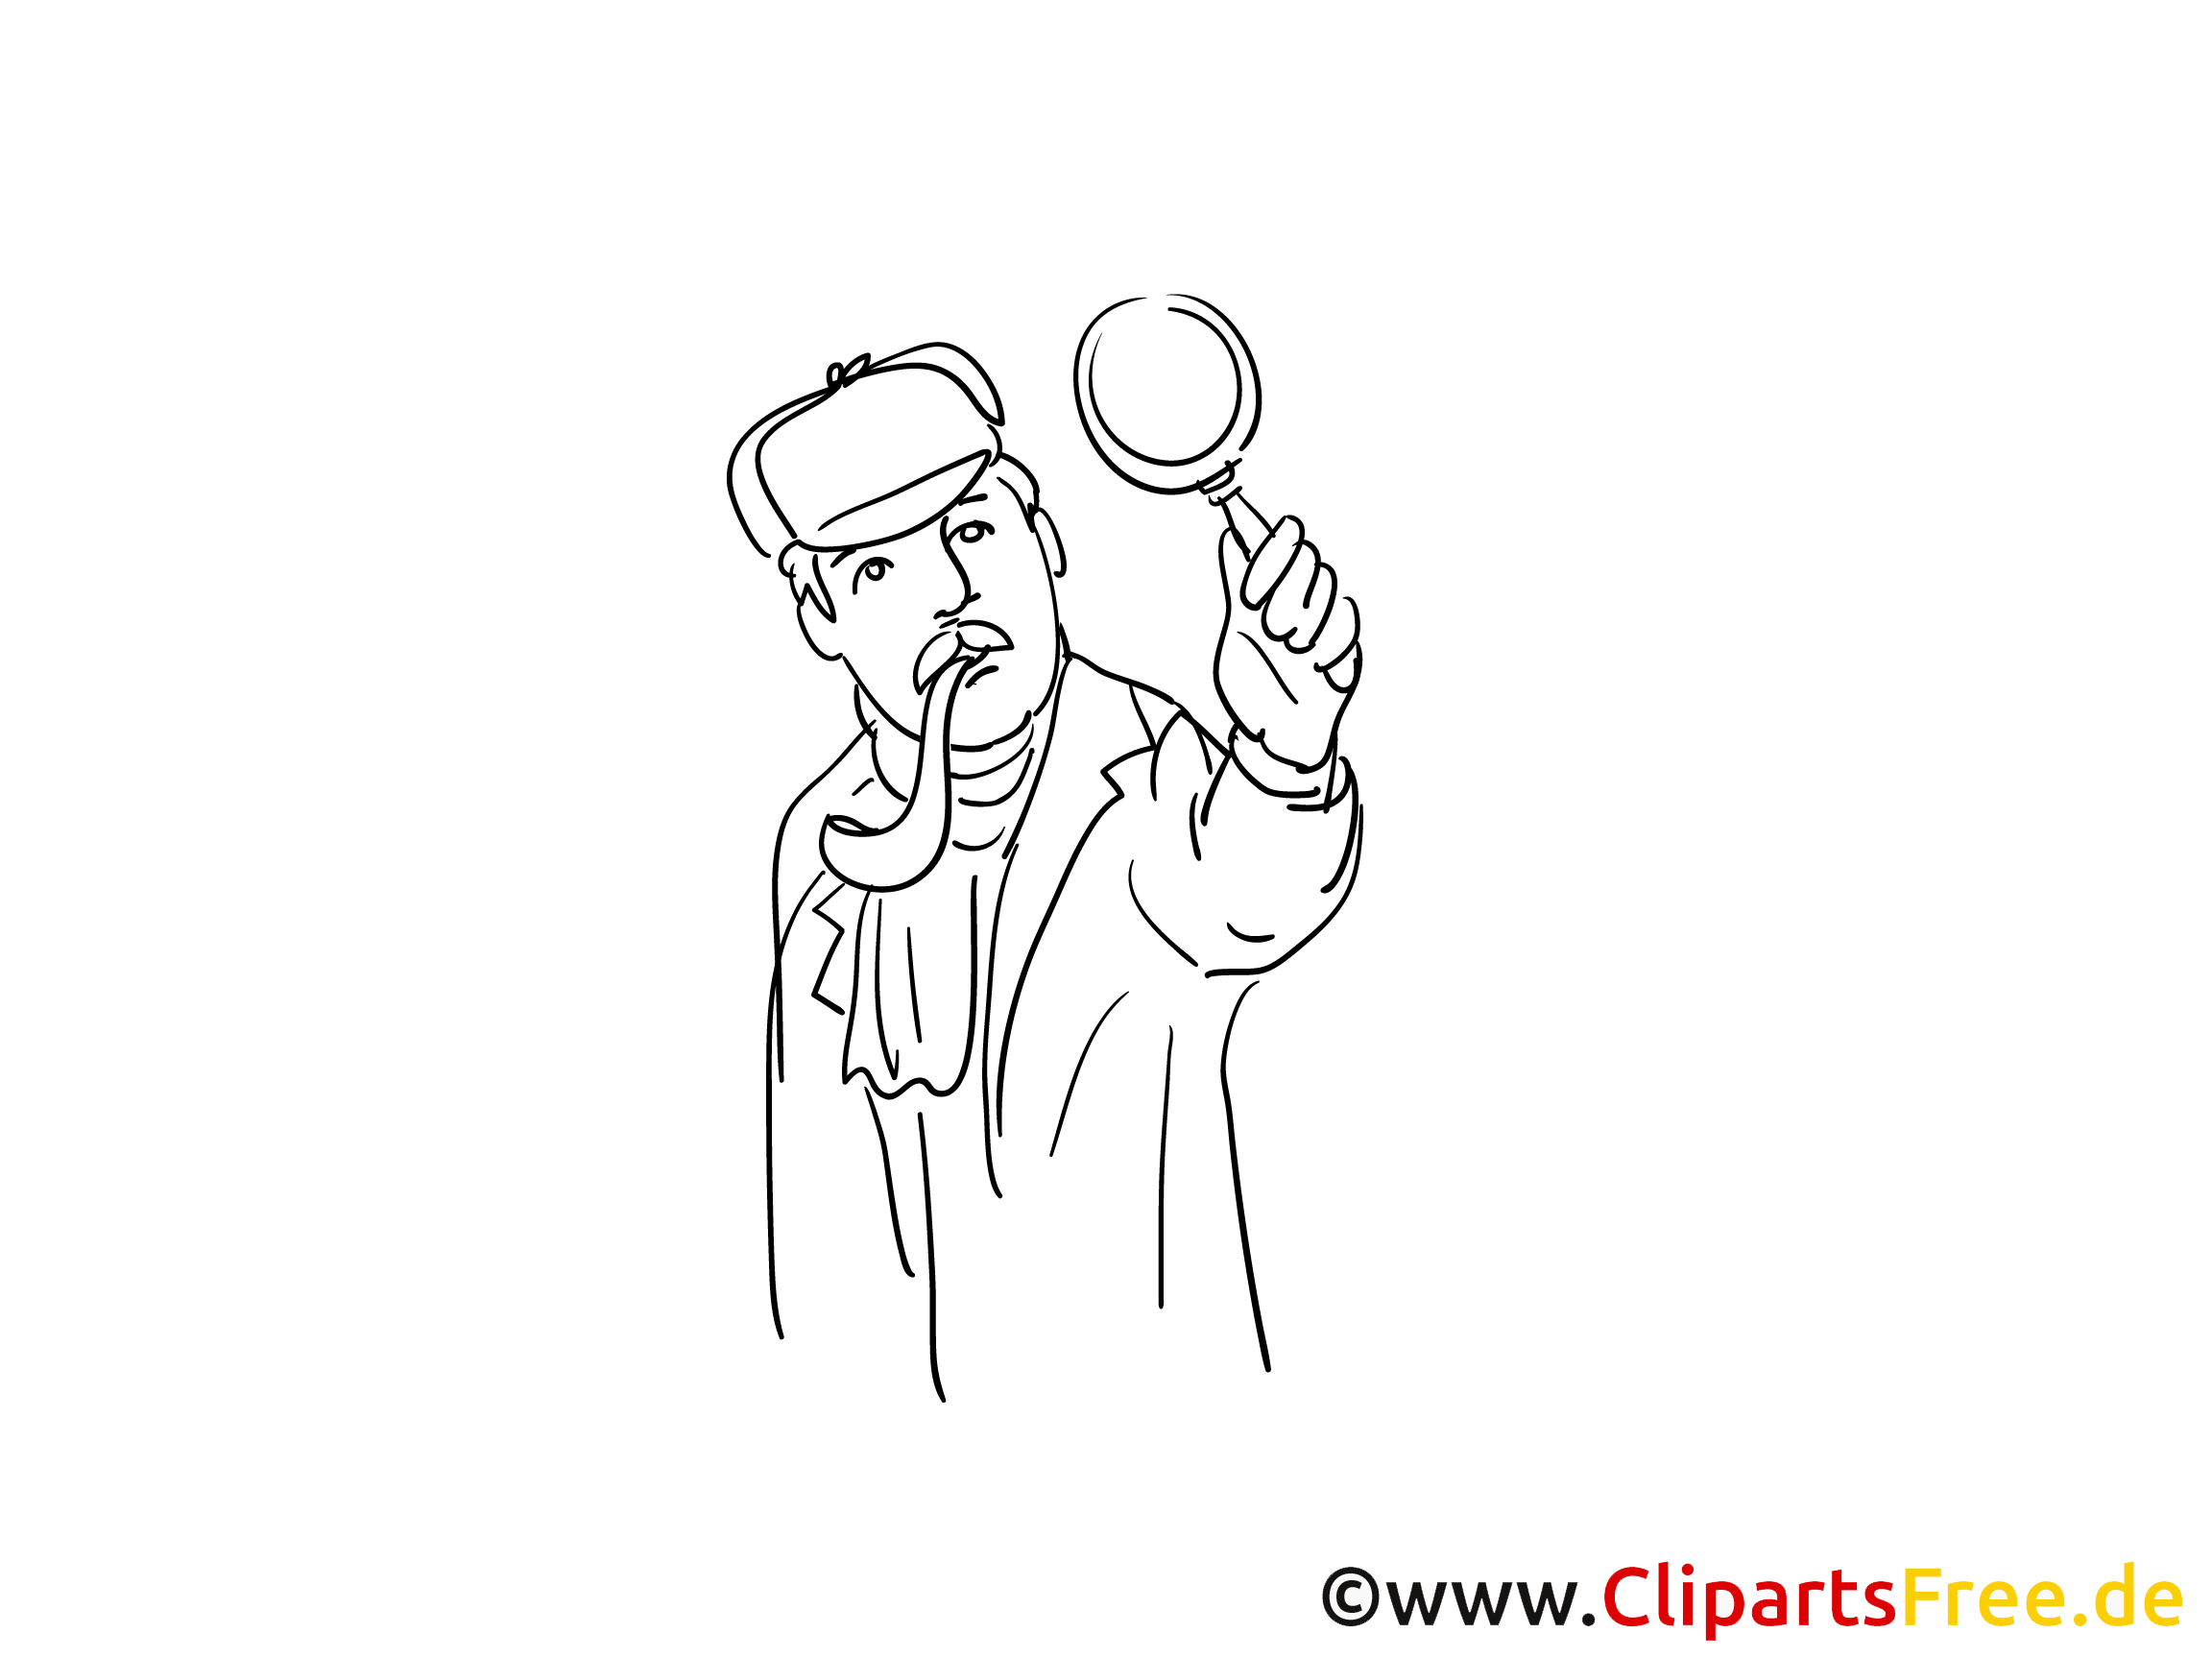 Sherlock Holmes Detektiv - Ausmalbilder Polizei